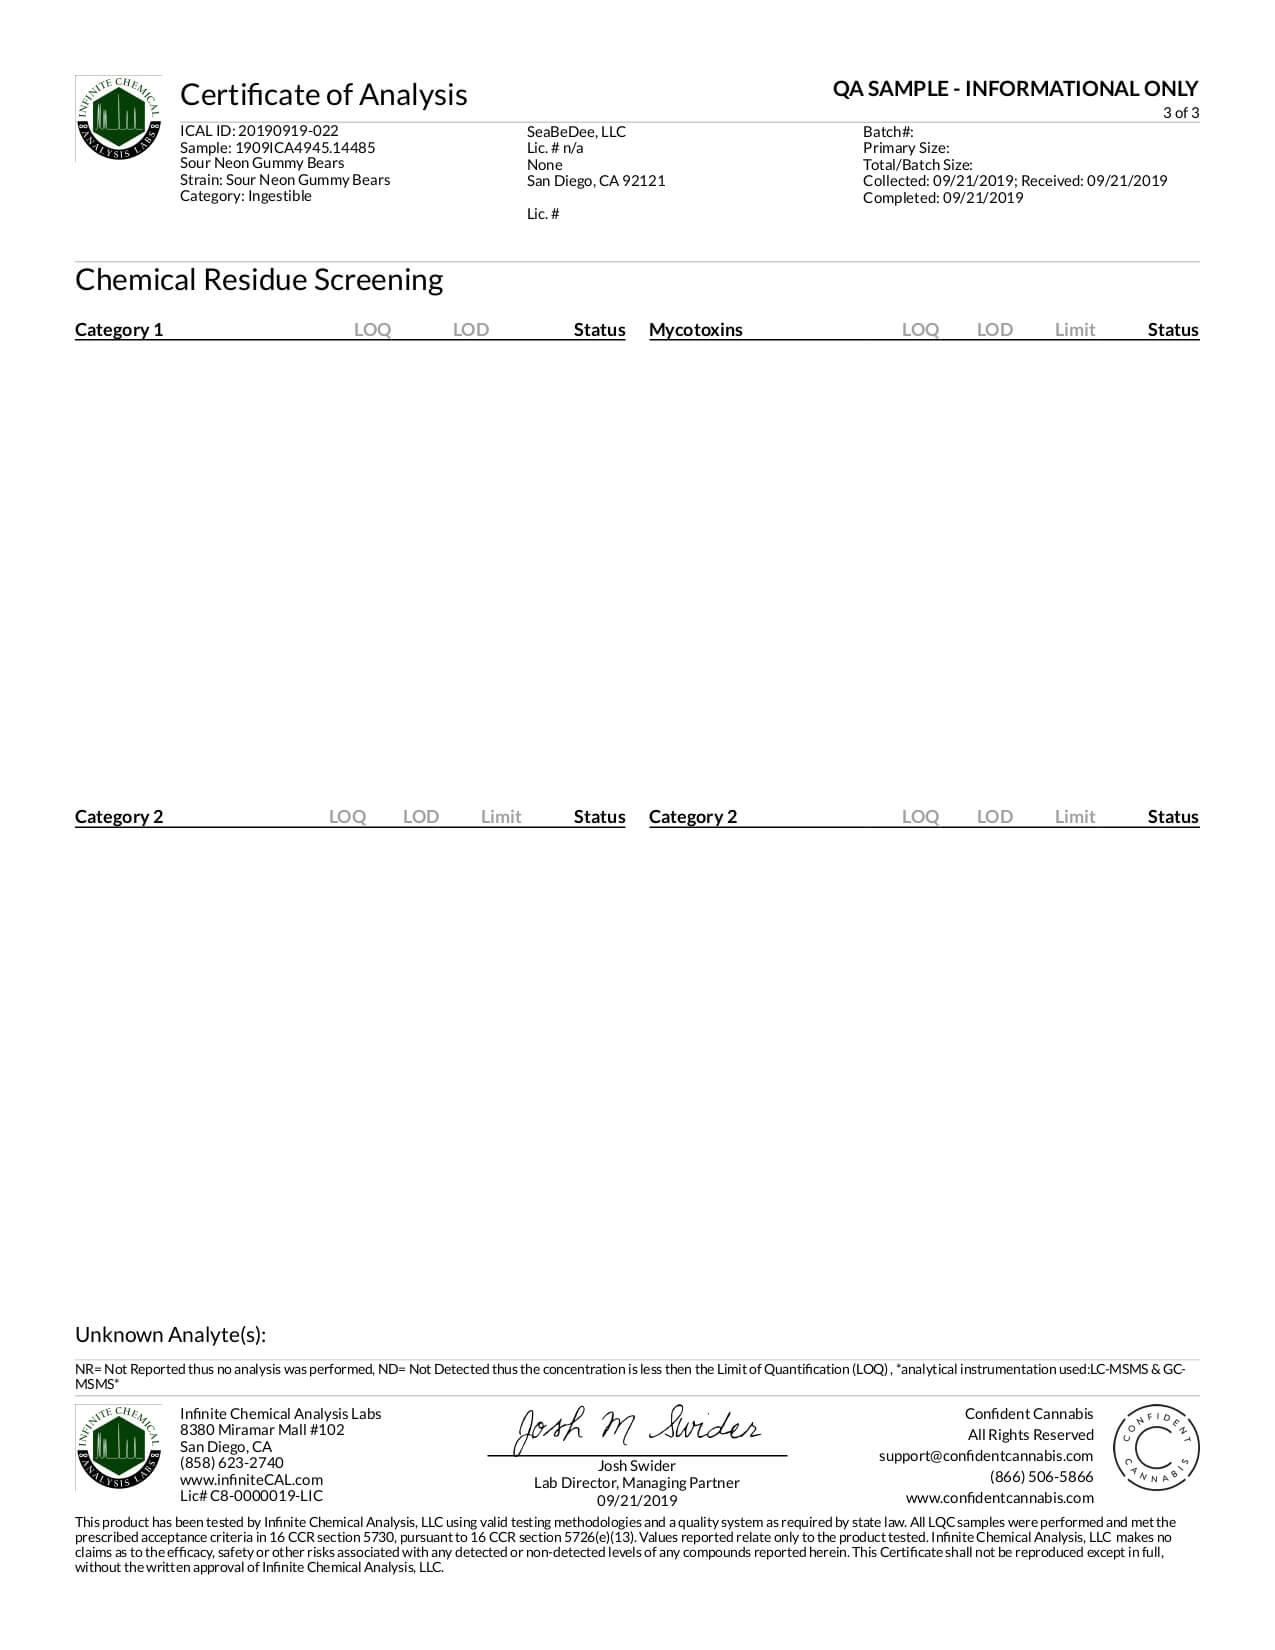 Seabedee CBD Edible Sour Neon Gummy Bears Lab Report